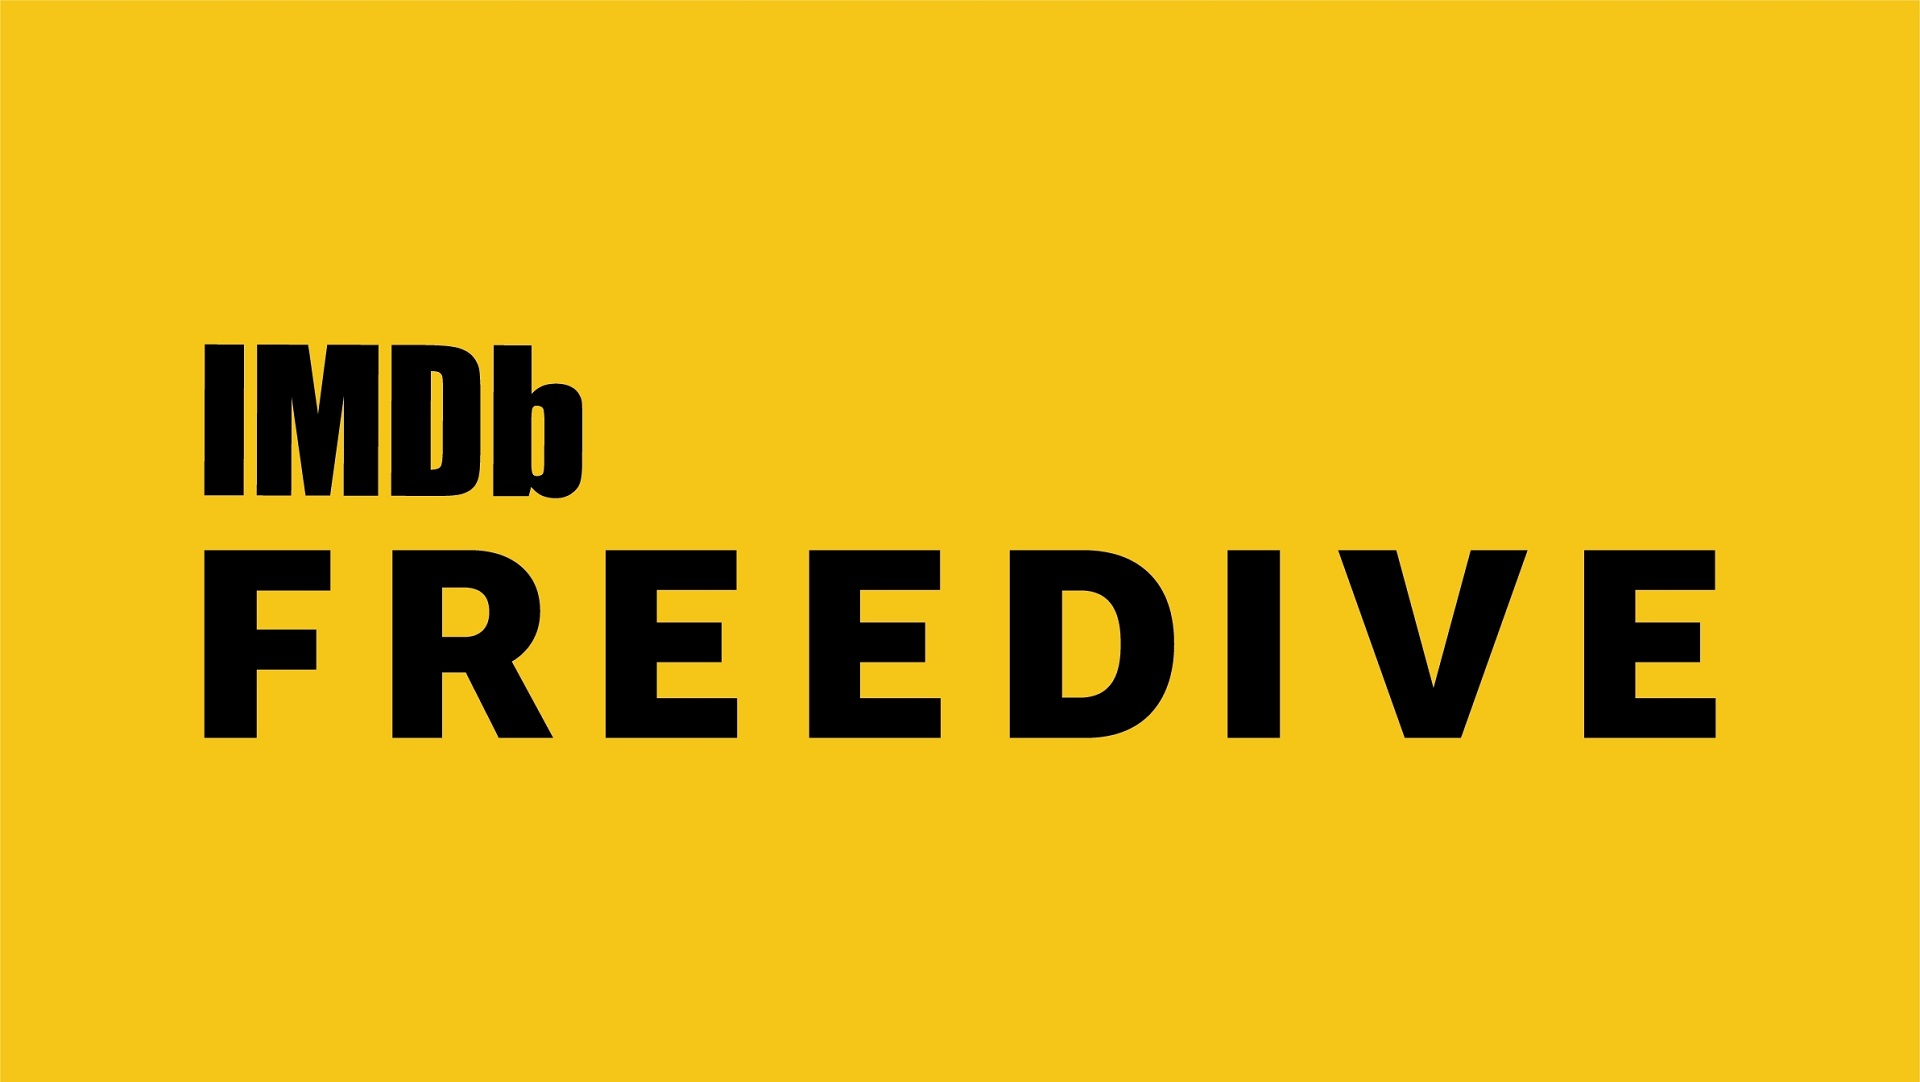 imdb-freedive